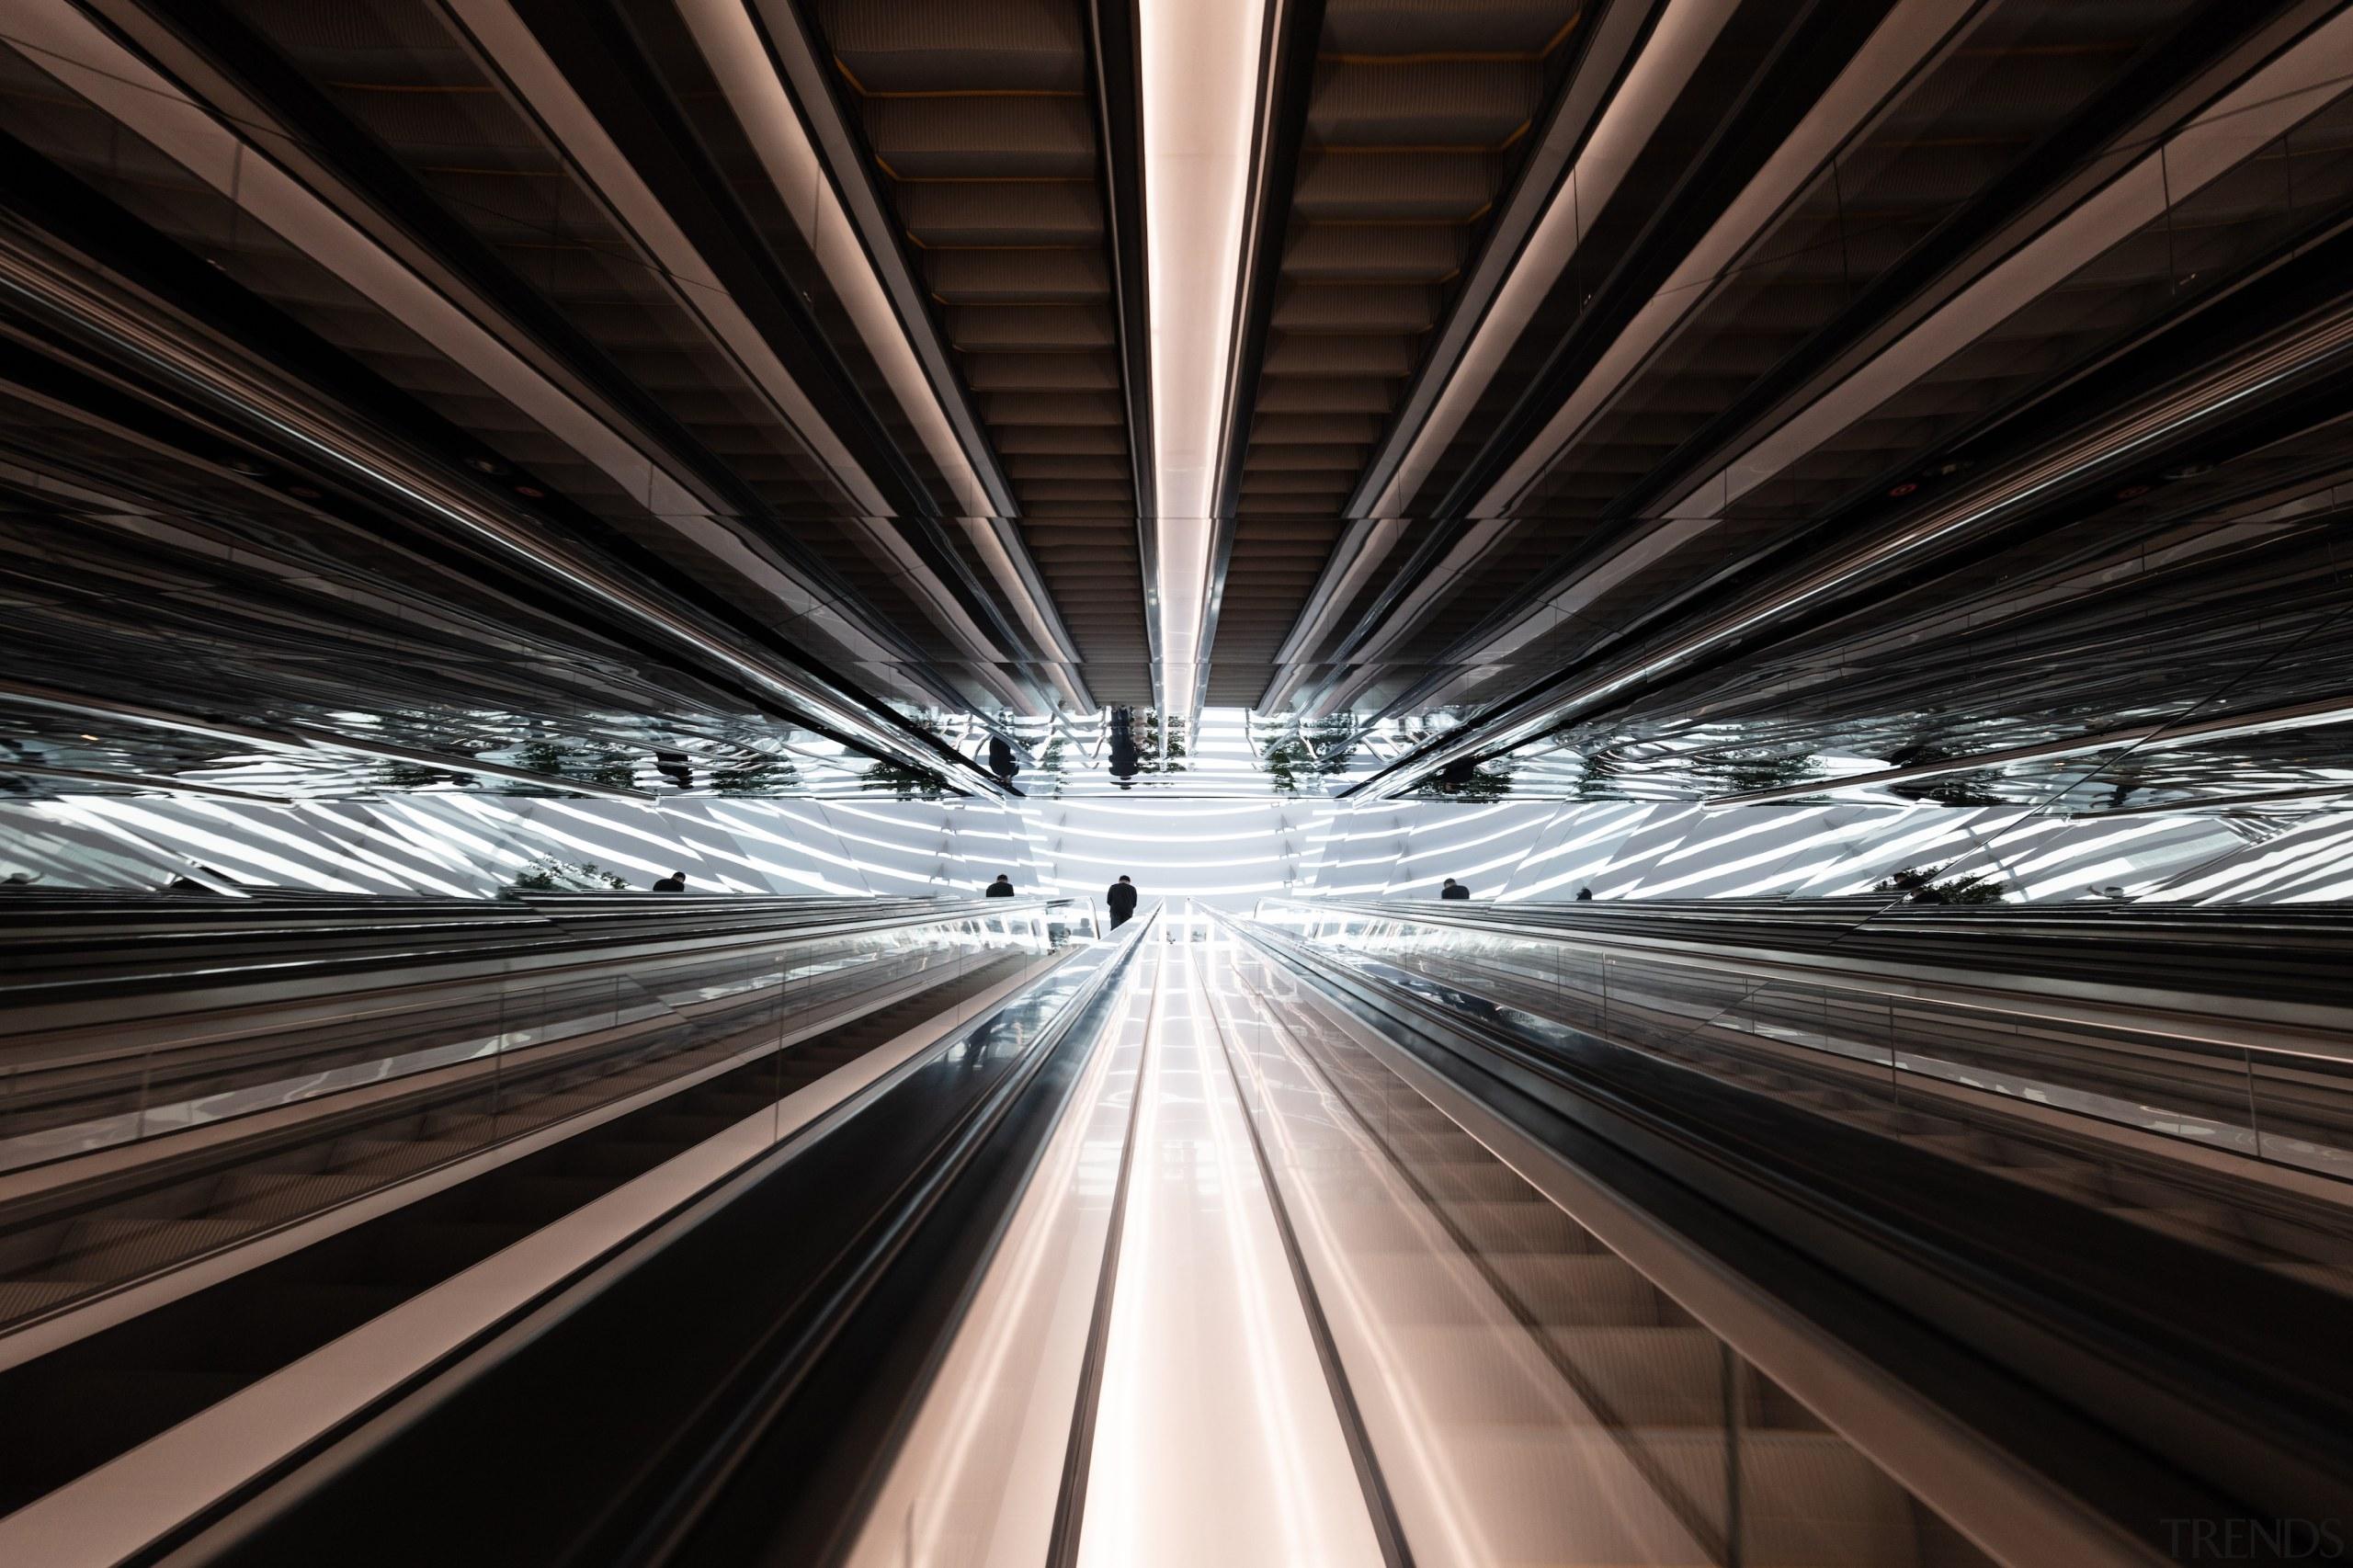 A set of dramatic escalators that take visitors